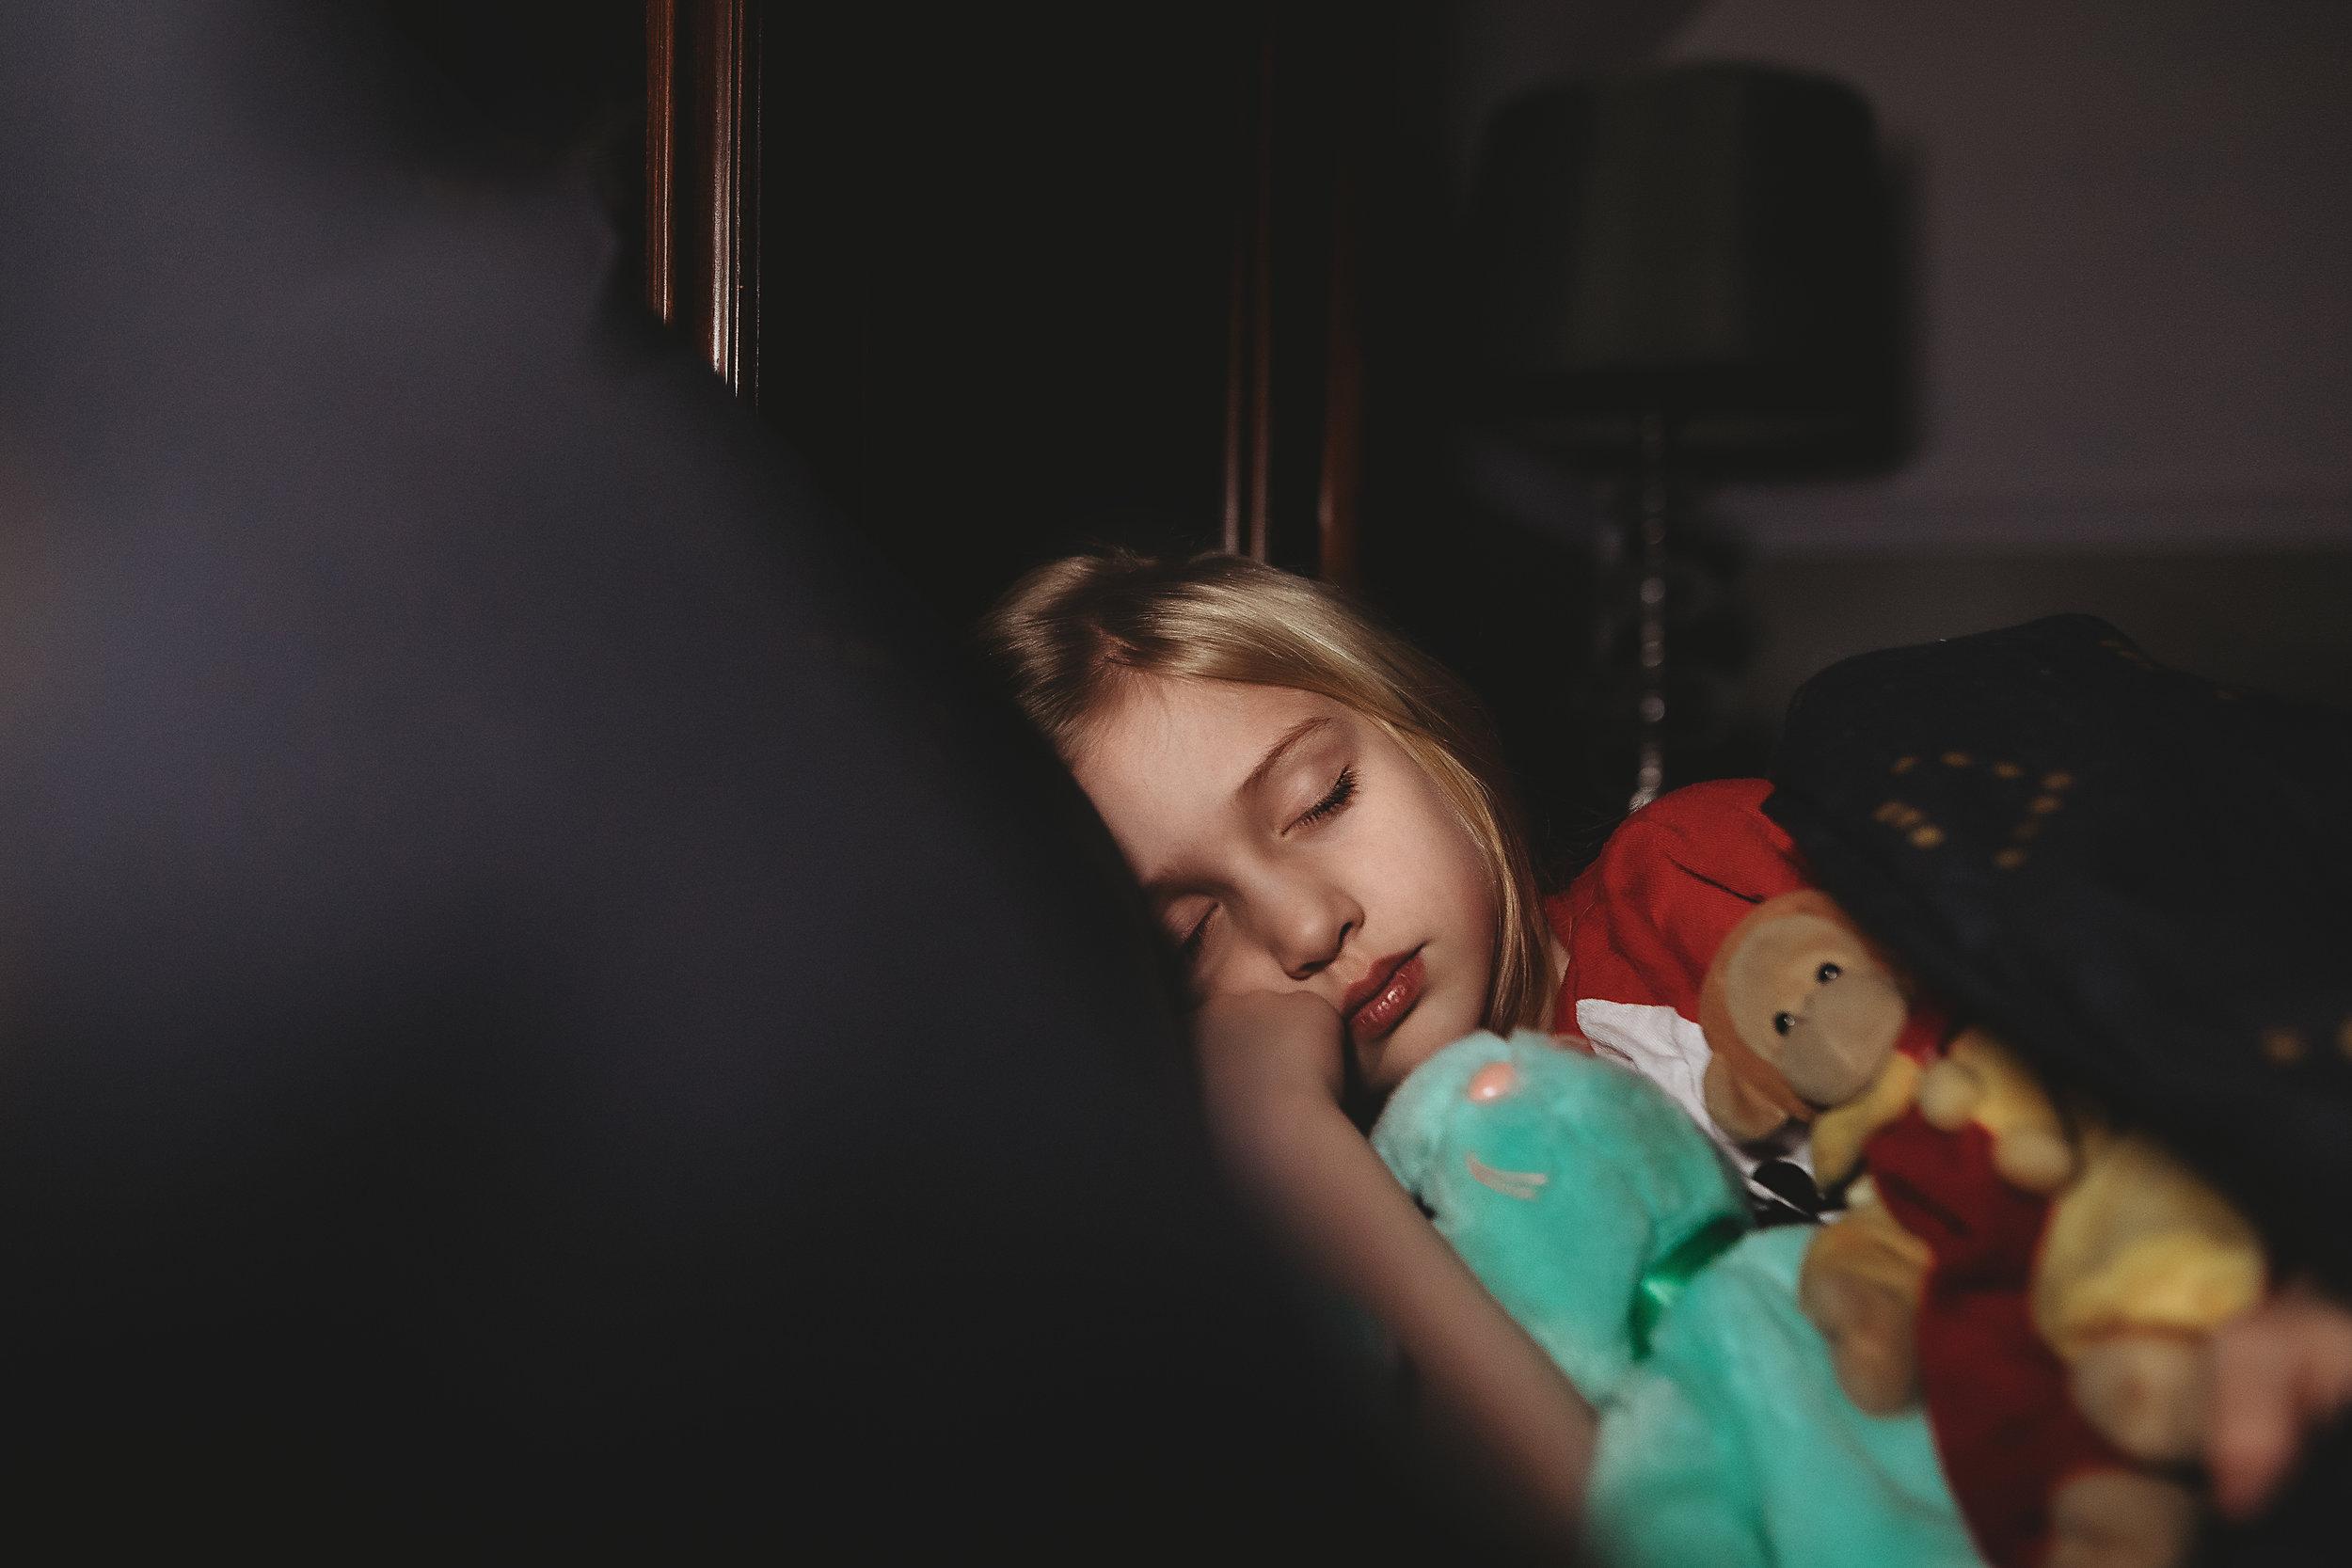 hello-olivia-photography-long-island-photographer-lifestyle-child-asleep-stuffed-animals.jpg